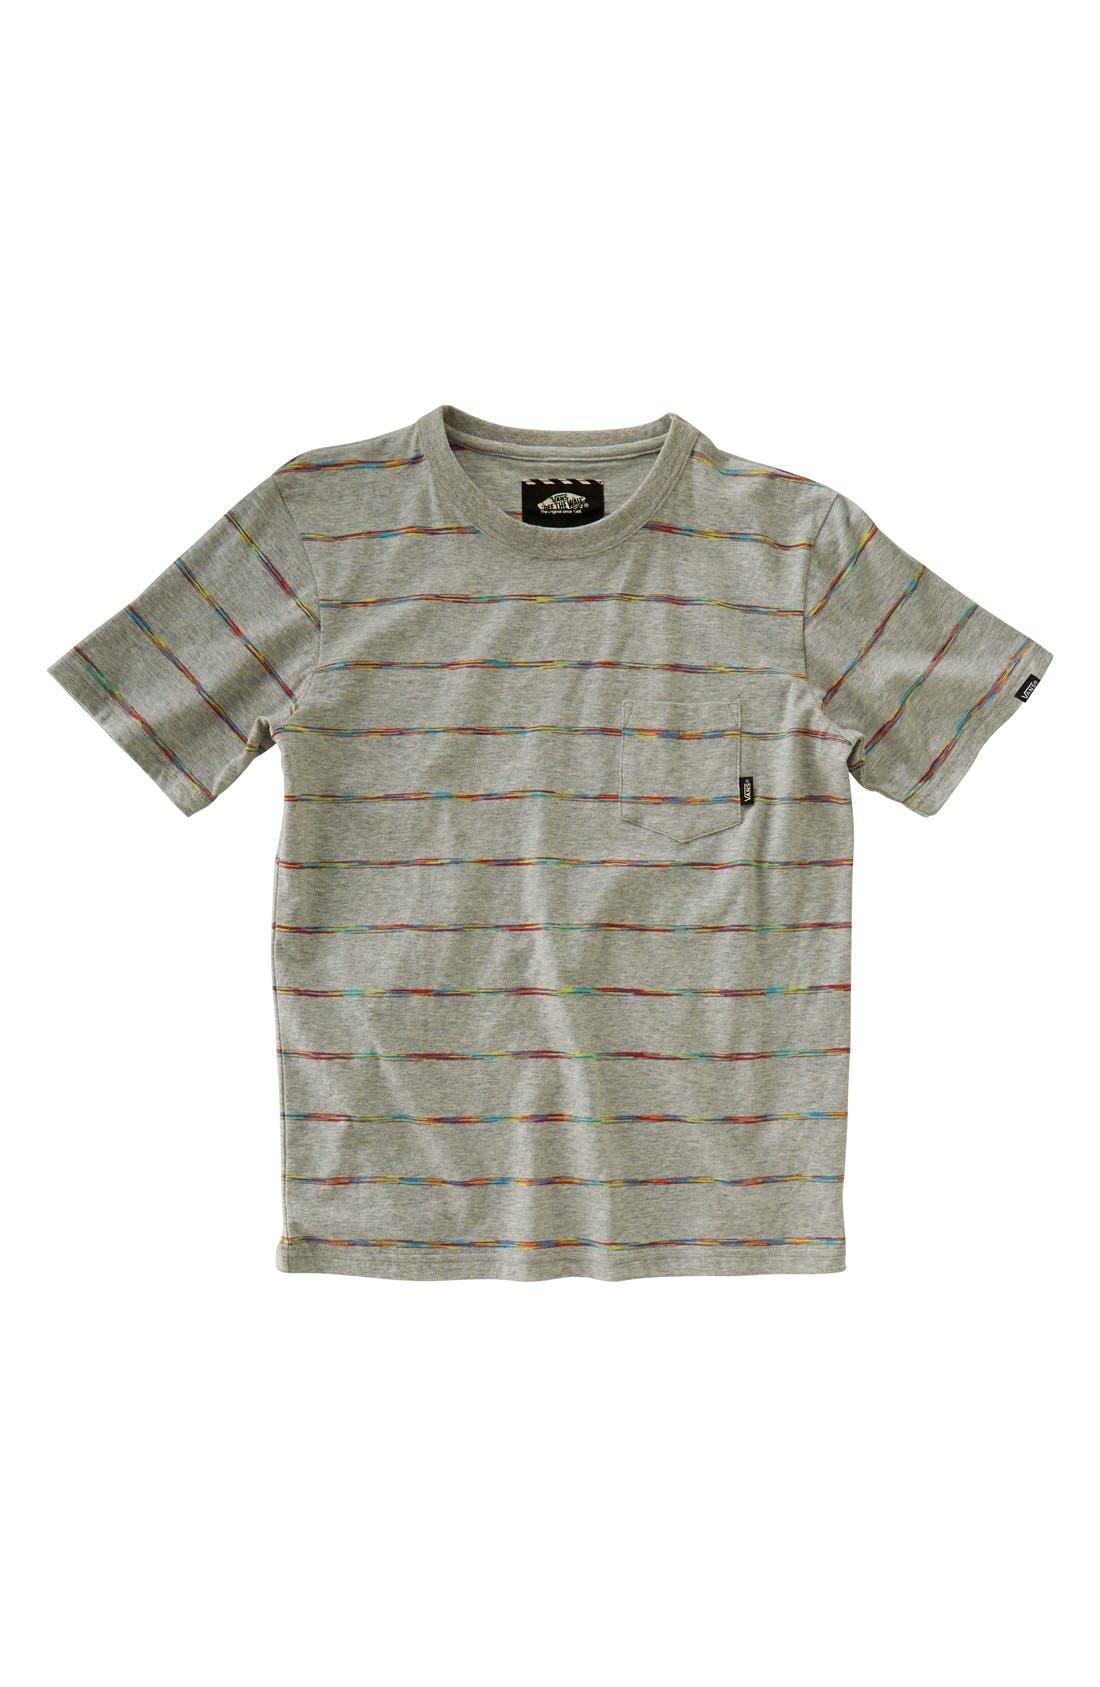 Alternate Image 1 Selected - Vans 'Lowden' Short Sleeve Pocket T-Shirt (Big Boys)